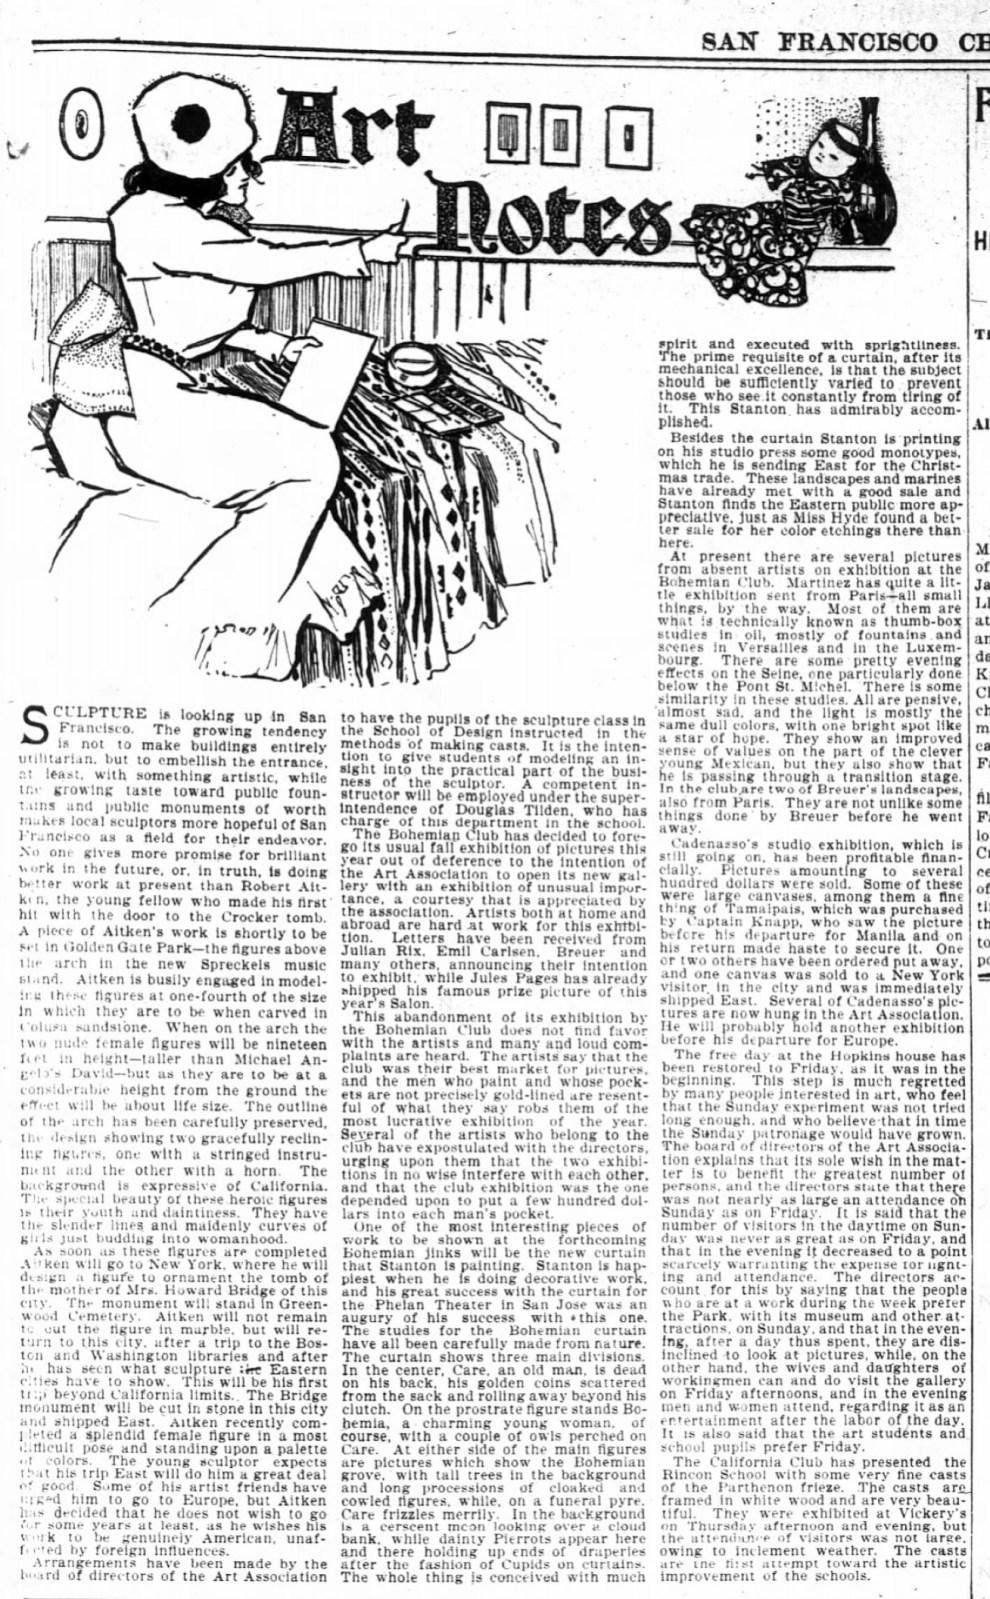 "San Francisco Chronicle. San Francisco, CA, ""Art Notes"", Sunday, October 15, 1899, page 25, not illustrated"